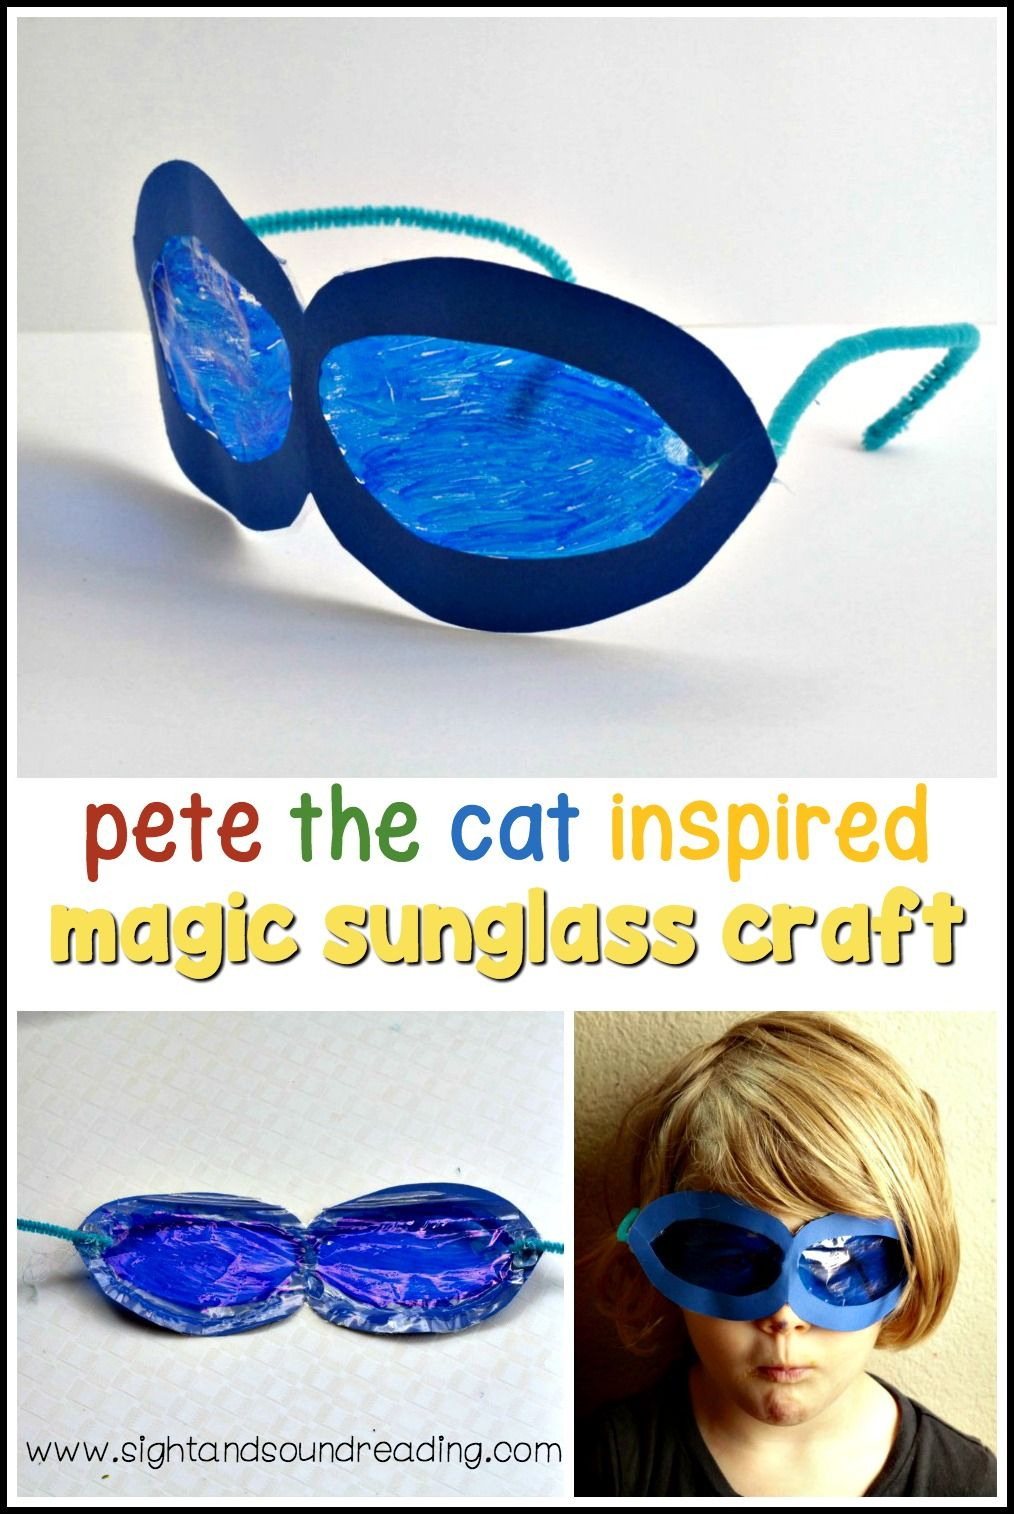 Pete The Cat Sunglasses Video